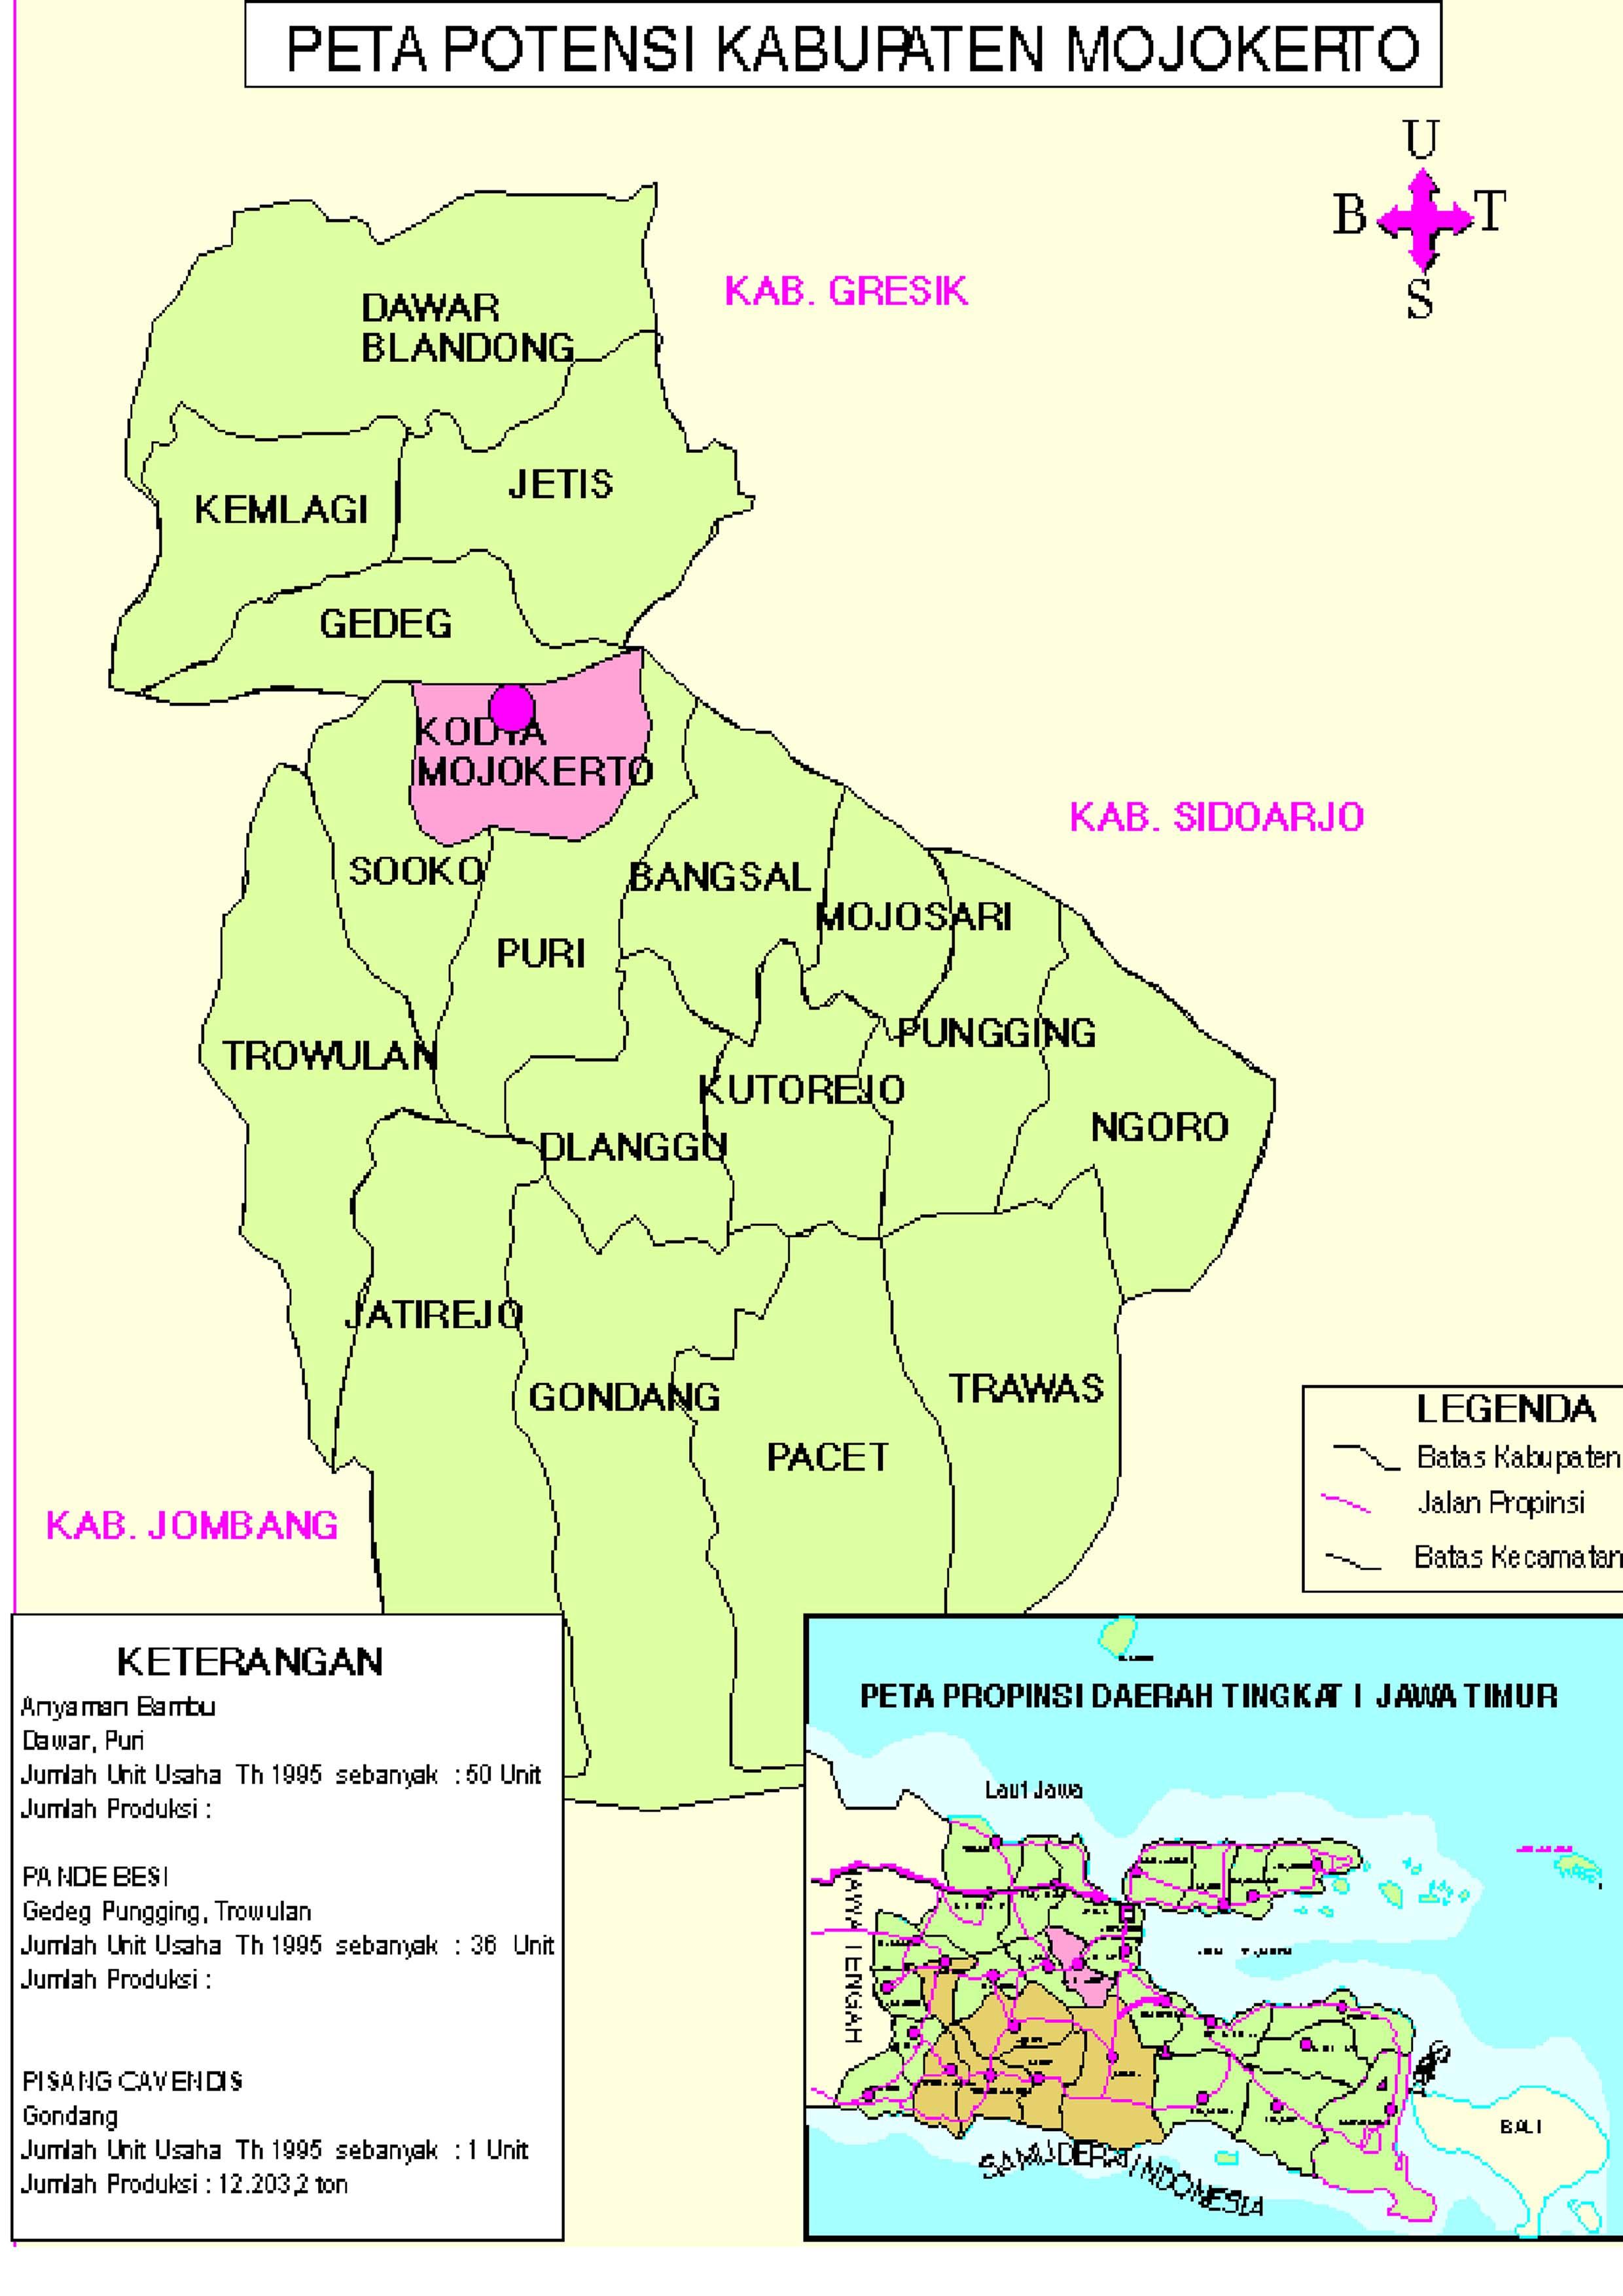 Profil Kabupaten Telecenter Kencono Wungu Peta Wilayah Mojokerto Tempat Candi